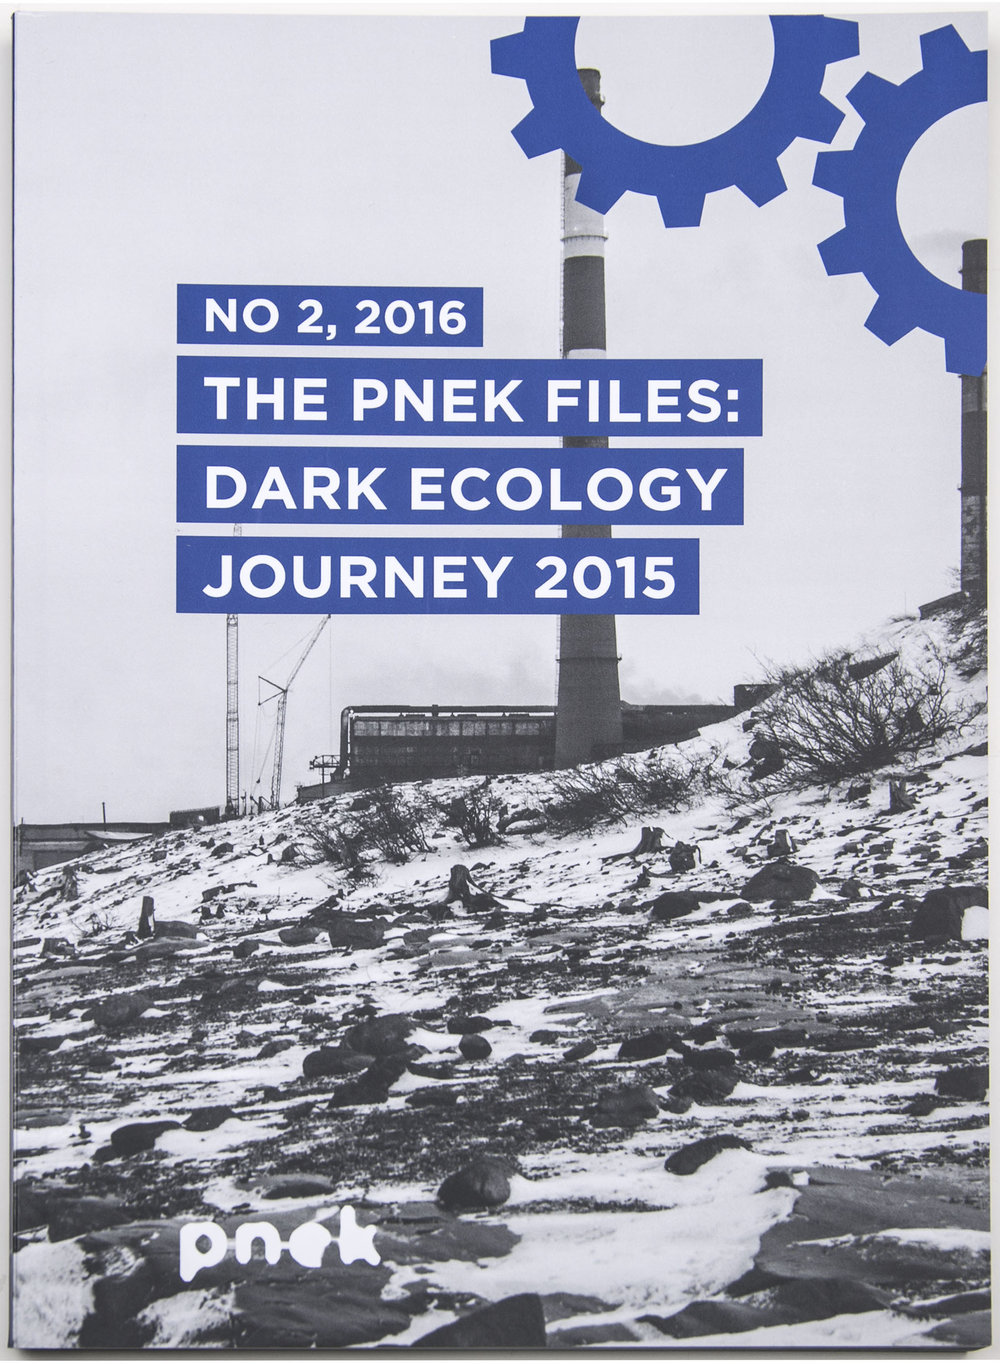 The PNEK Files (No 2): Dark Ecology  Stahl Stenslie, Zane Cerpina (eds.). PNEK, 2016. ISBN: 978-82-93658-03-0